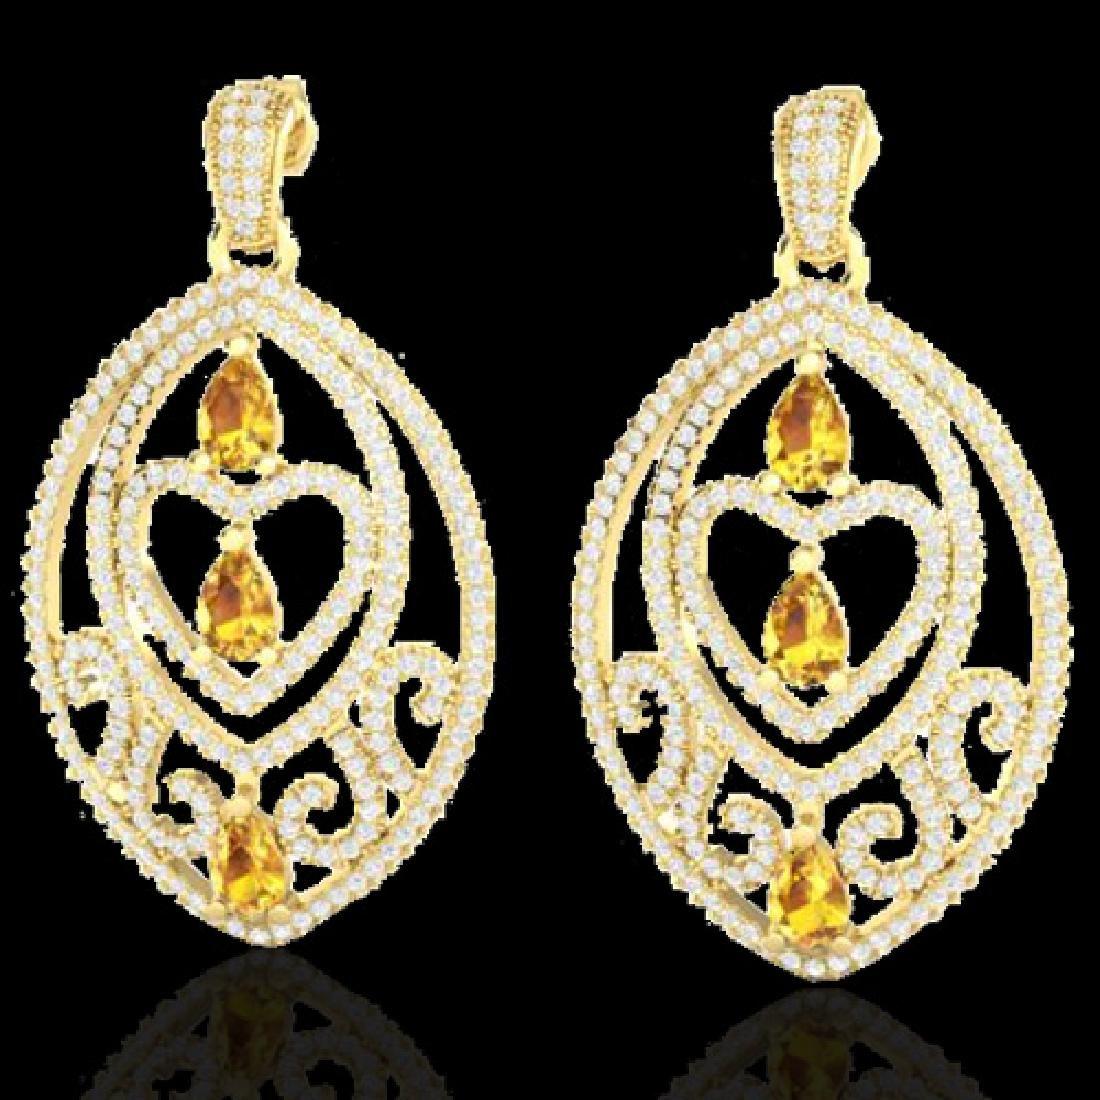 7 CTW Yellow Sapphire & Micro Pave VS/SI Diamond Heart